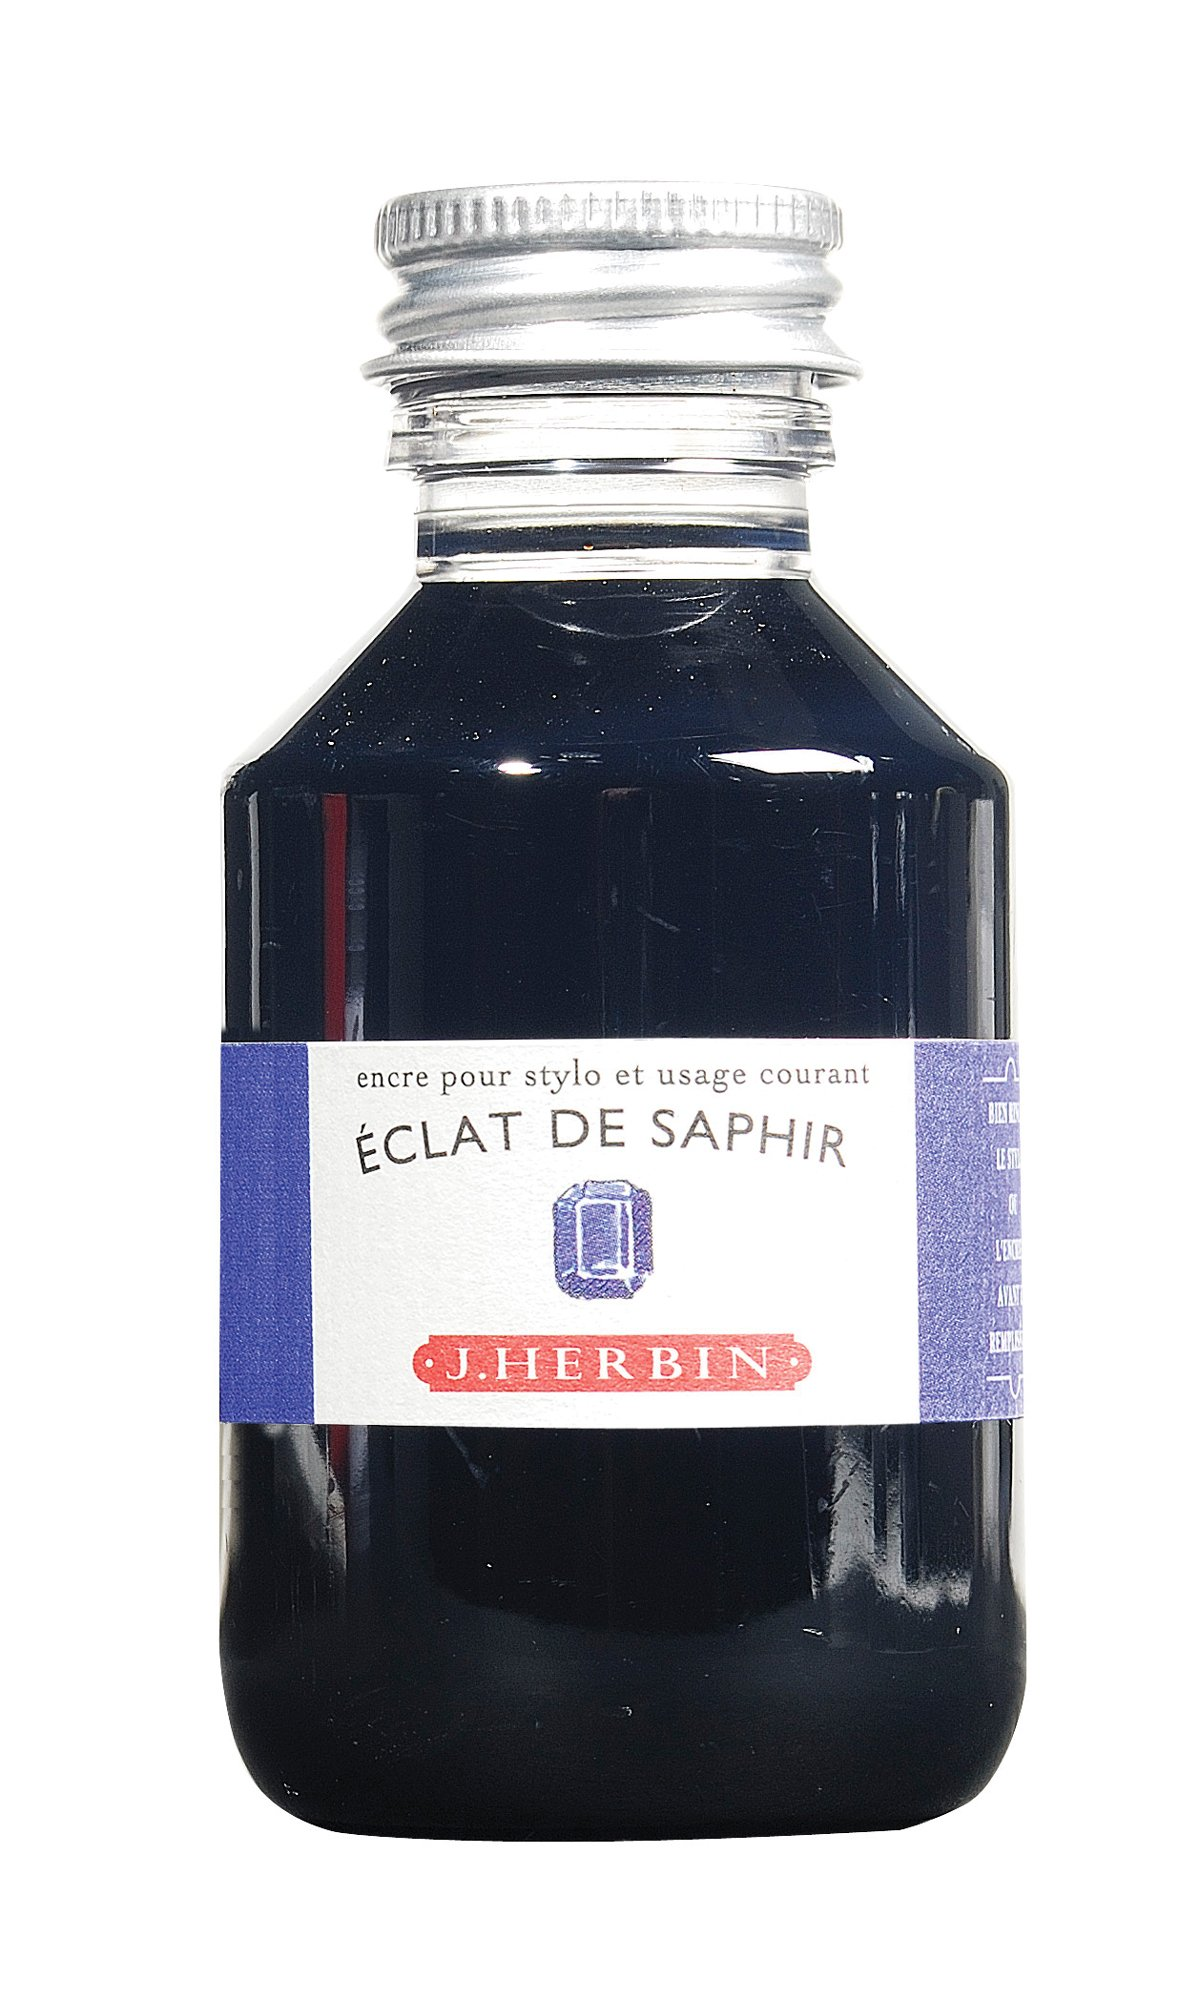 J. Herbin Fountain Pen Ink - 100 ml Bottled - Eclat de Saphir